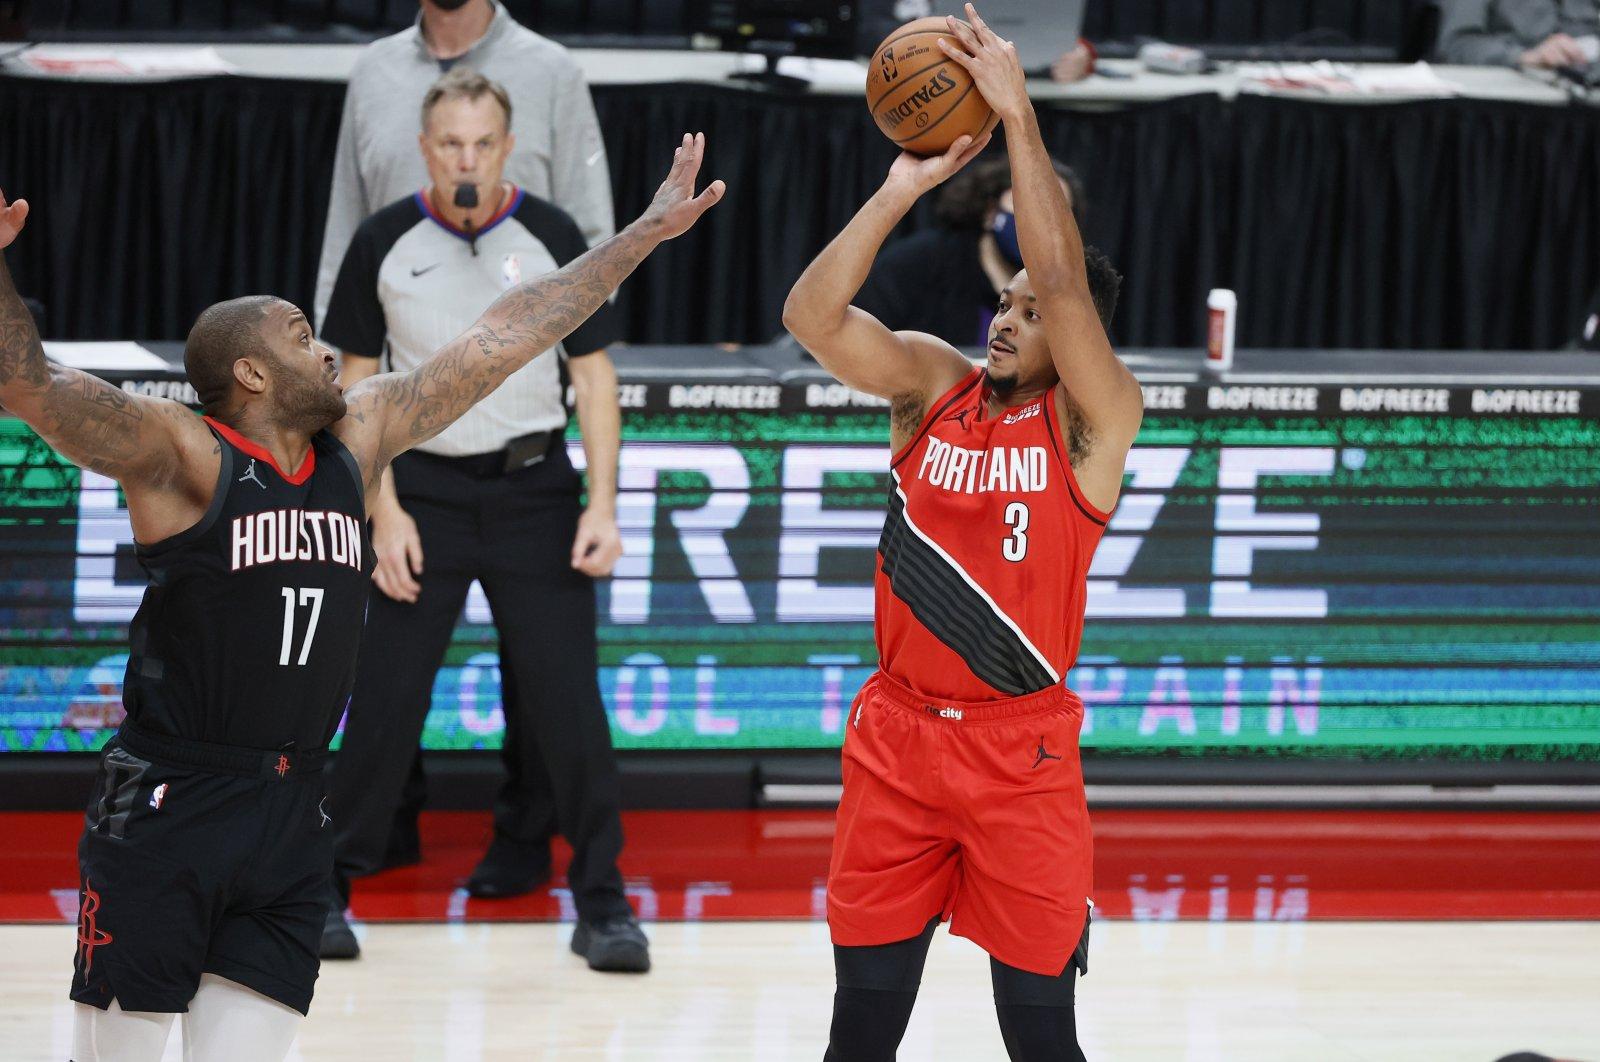 Portland Trail Blazers' CJ McCollum (R) shoots over Houston Rockets' P.J. Tucker during an NBA game at the Moda Center in Portland, Oregon, U.S., Dec. 26, 2020. (Reuters Photo)